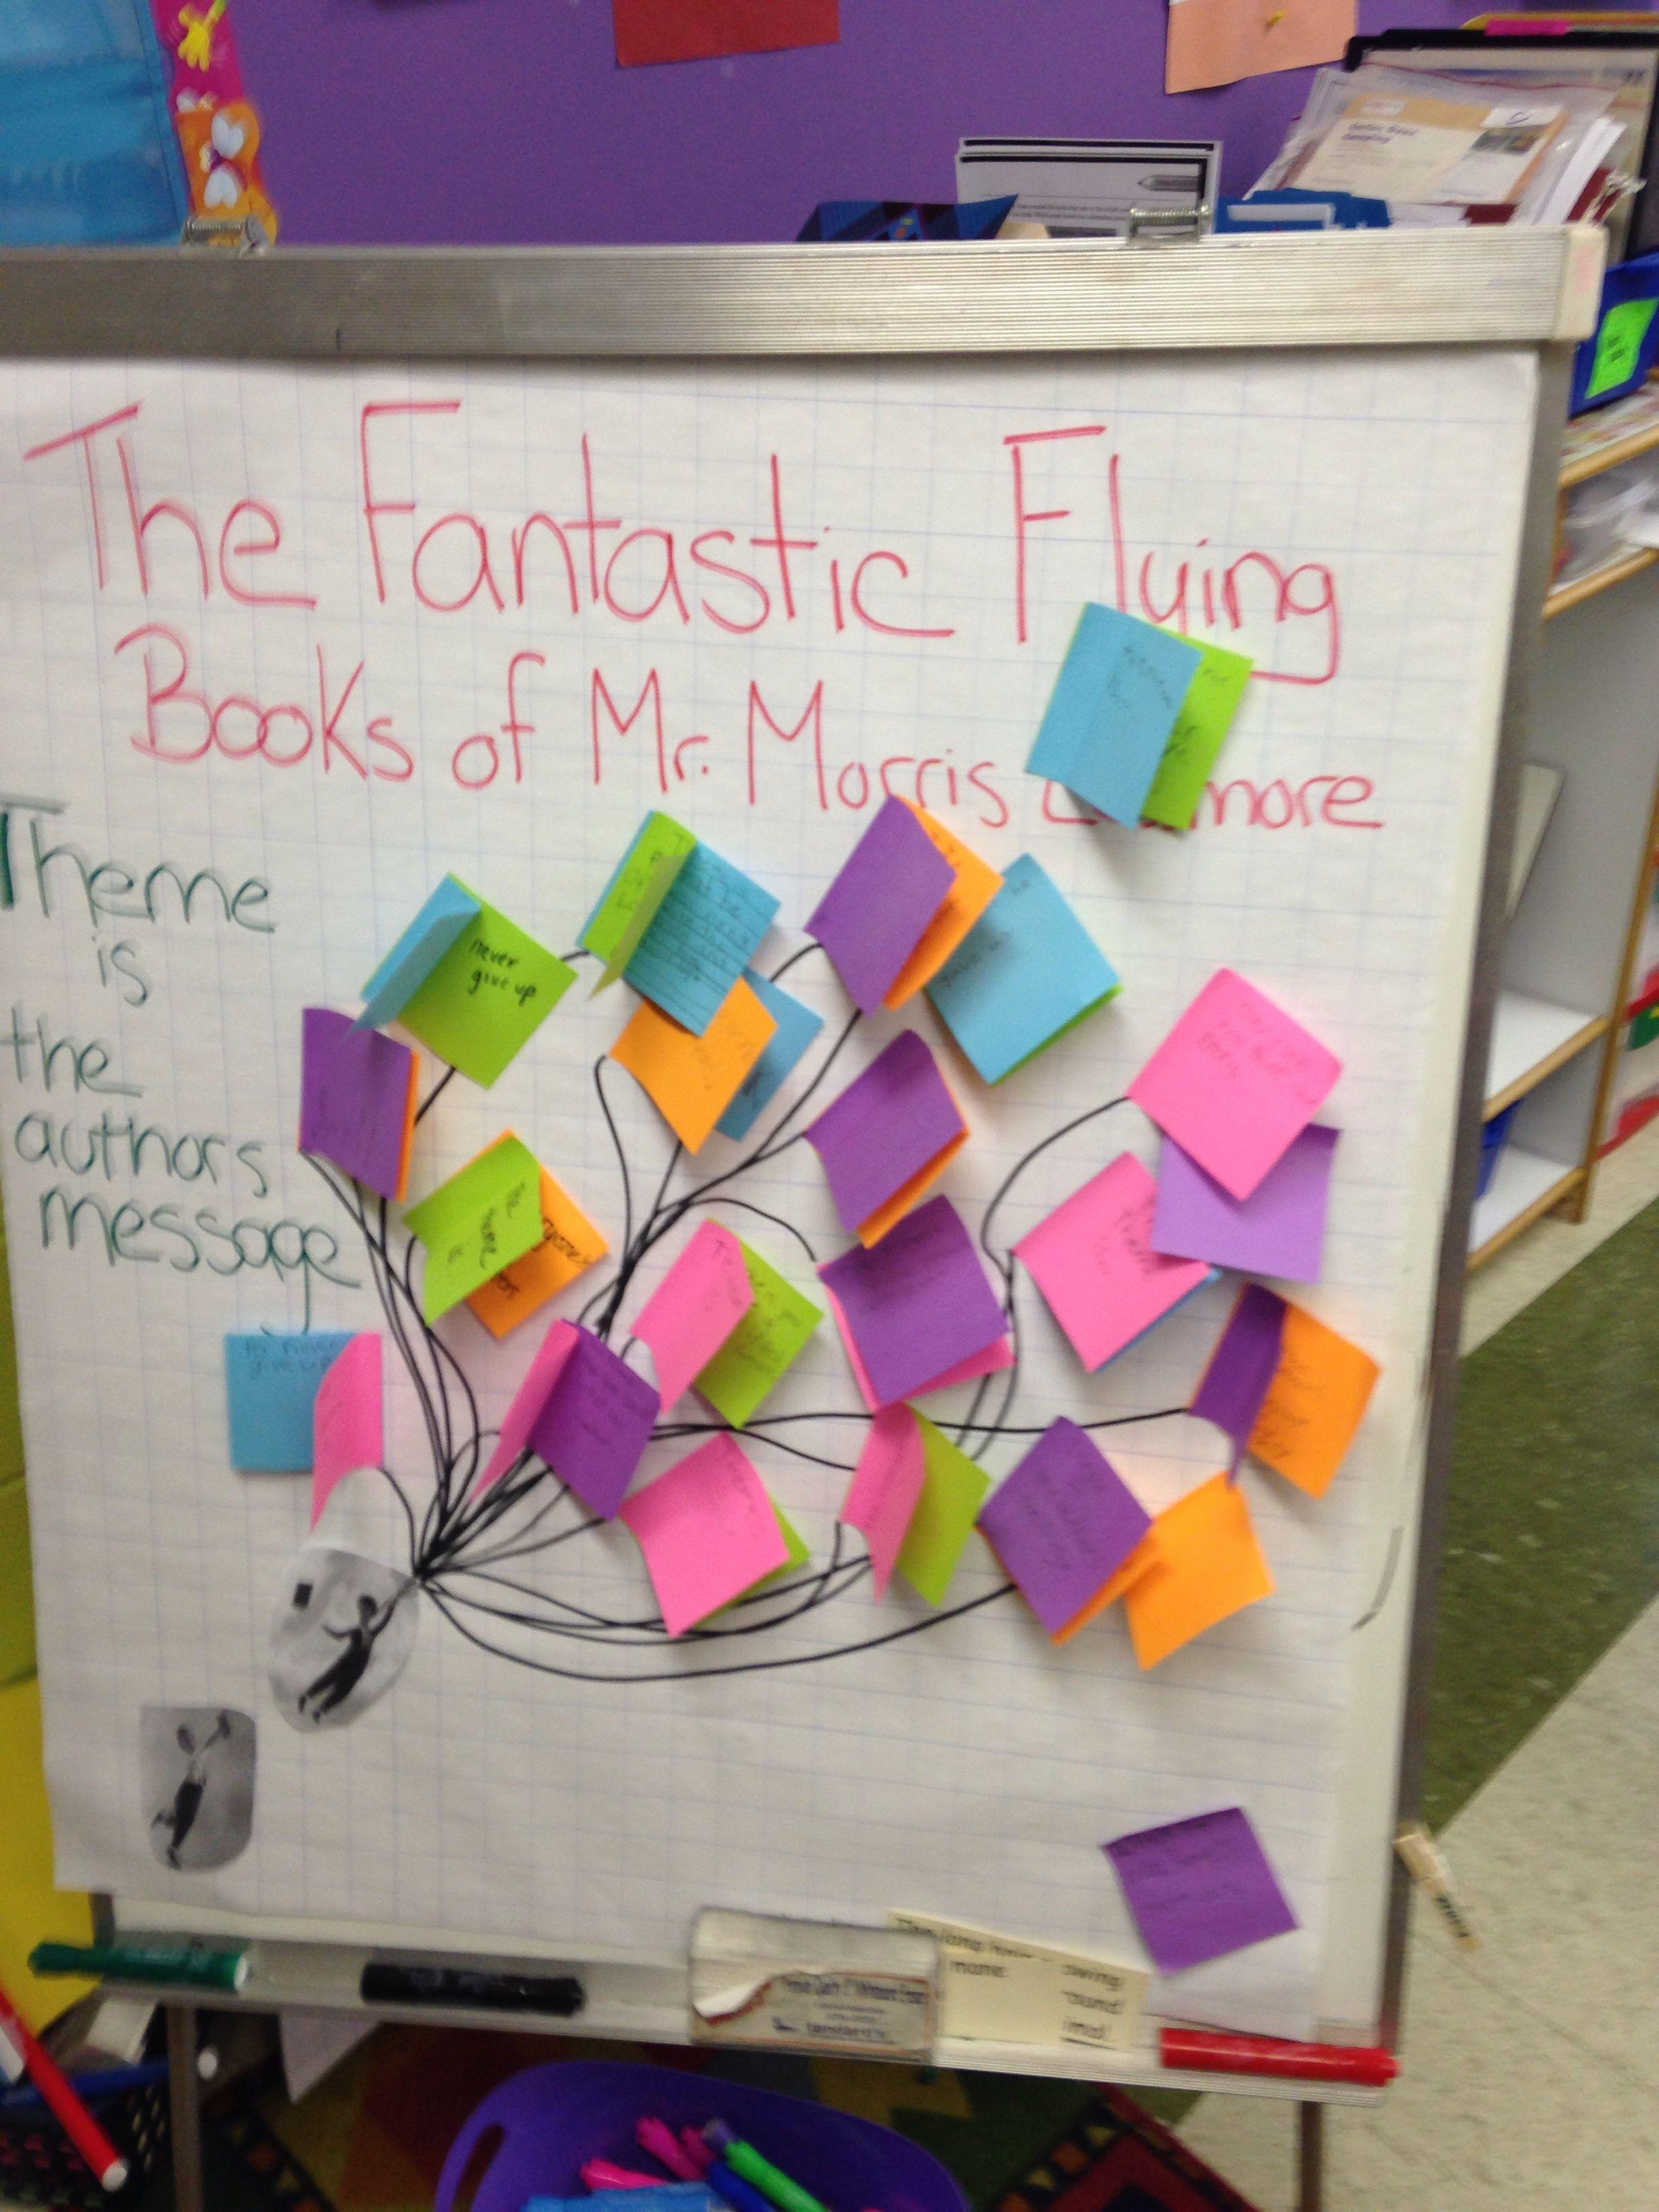 fantastic flying books of mr morris lessmore theme activity